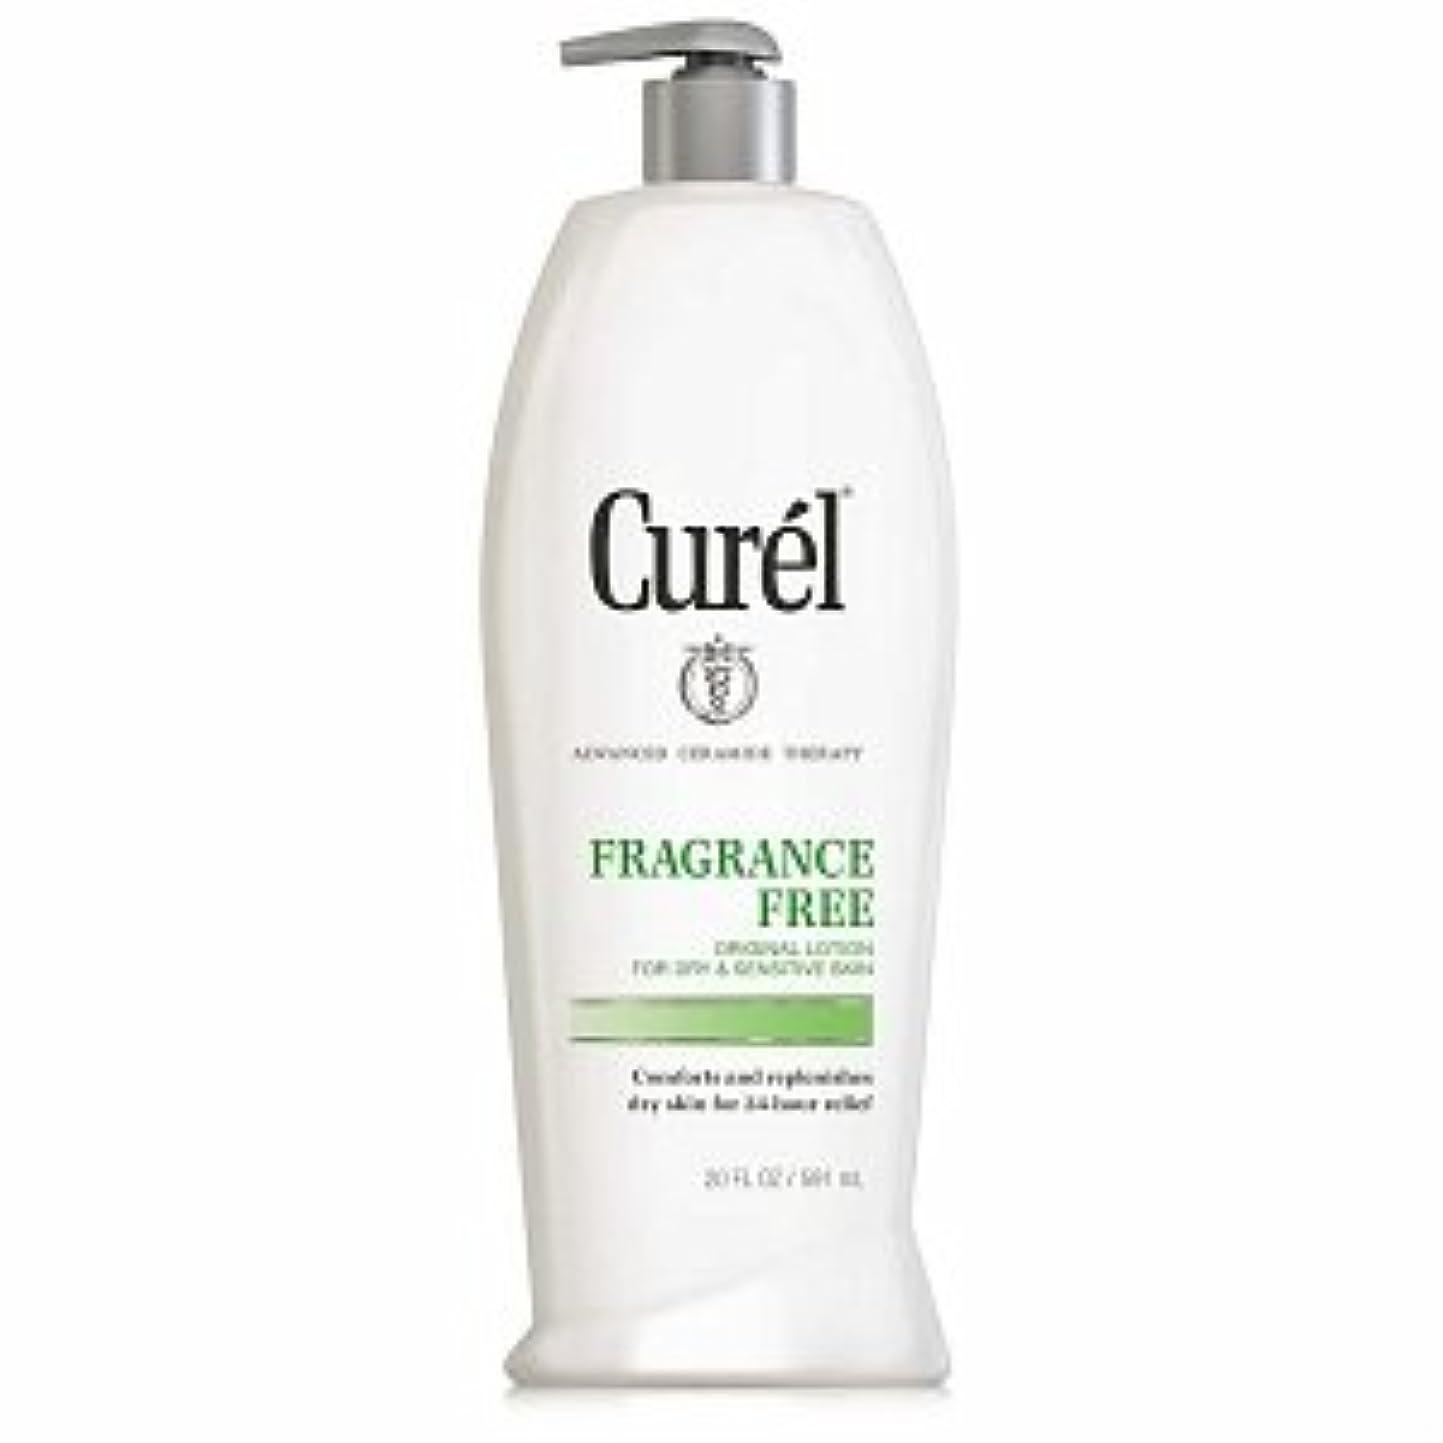 Curel Fragrance Free Original Lotion For Dry&Sensitive Skin - 13 fl oz  ポンプ式